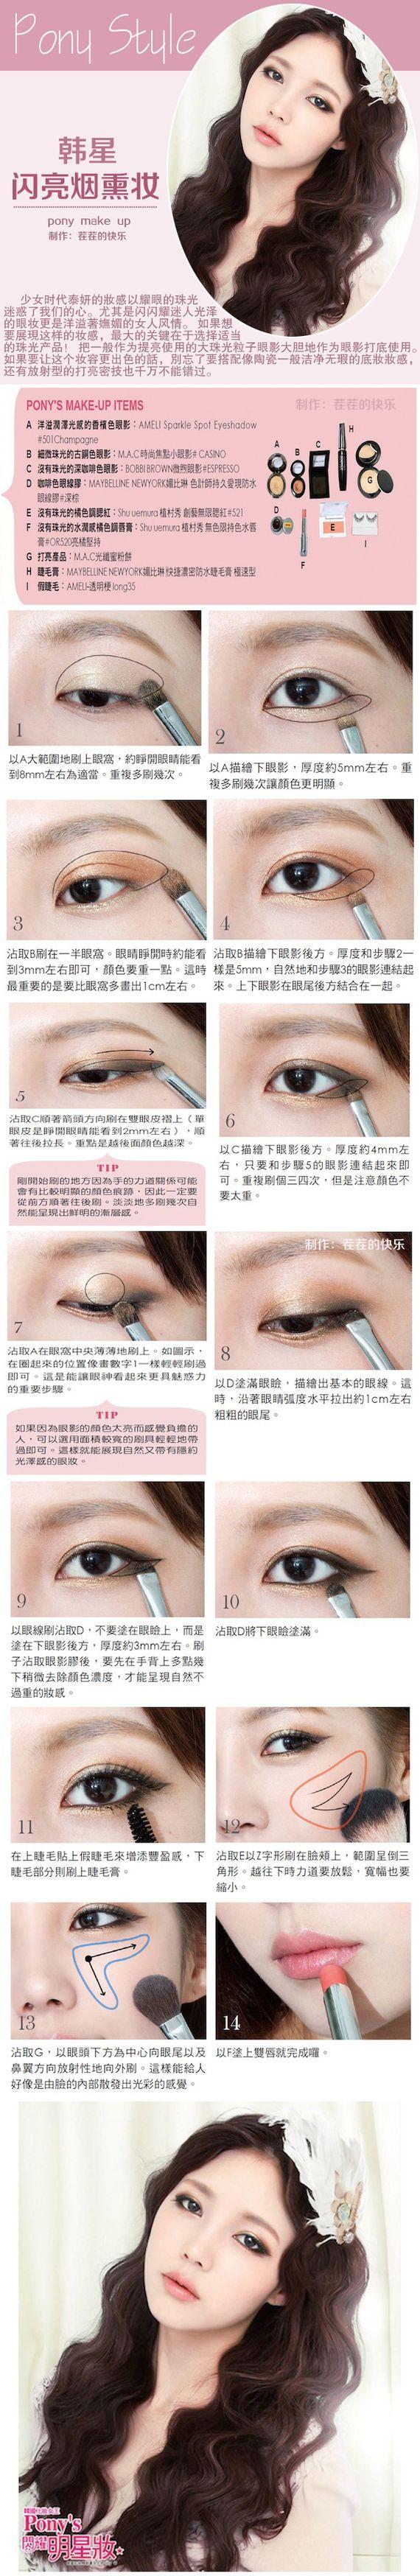 ponystyle makeup